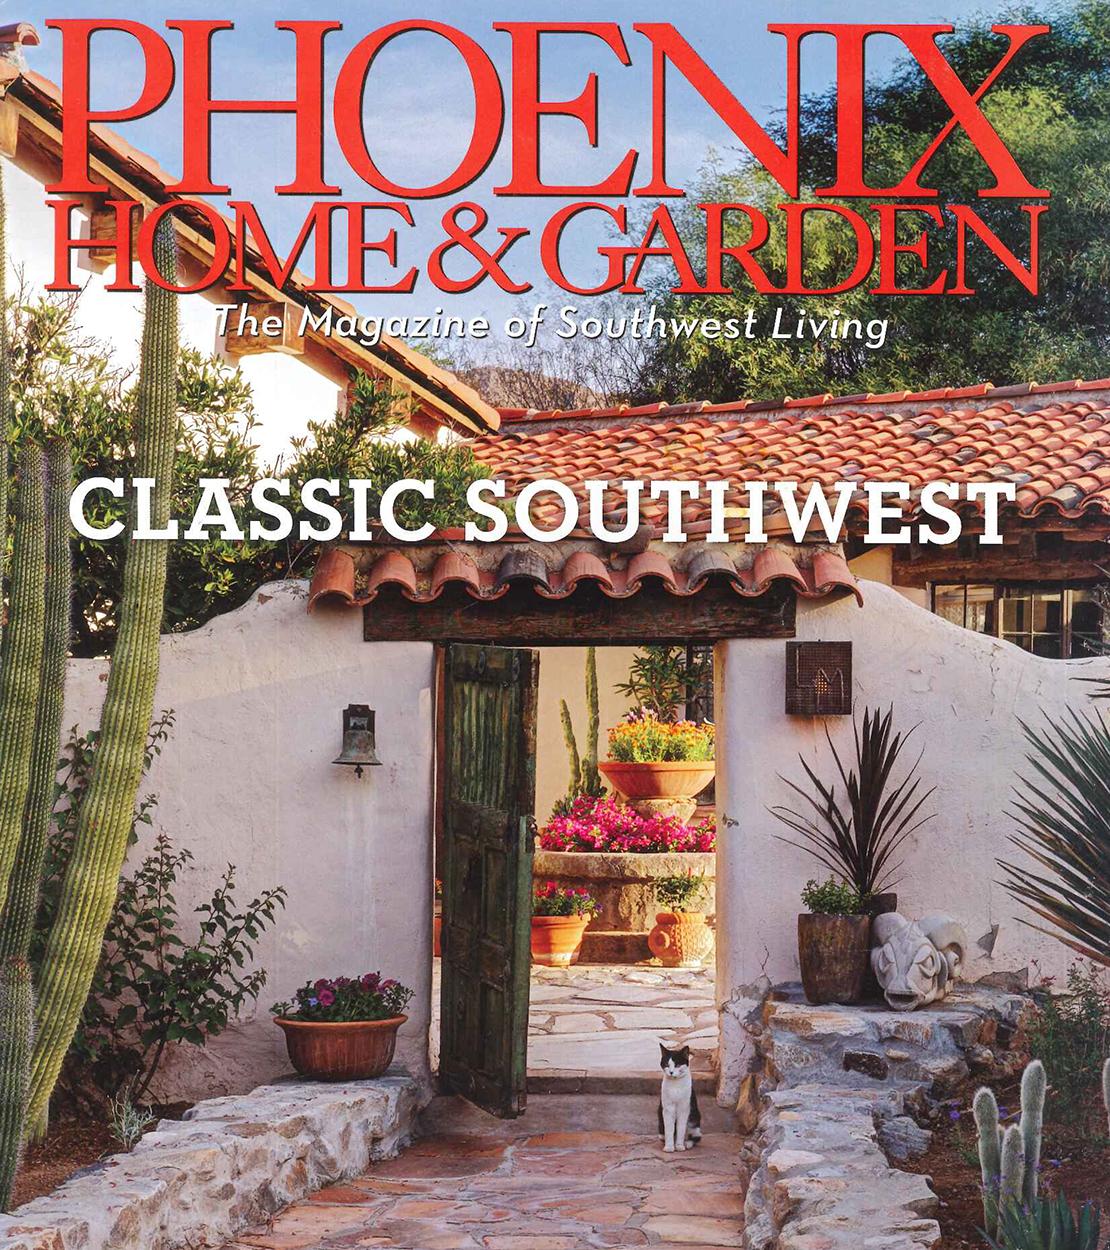 Phoenix Home & Garden - July 2013; Scottsdale